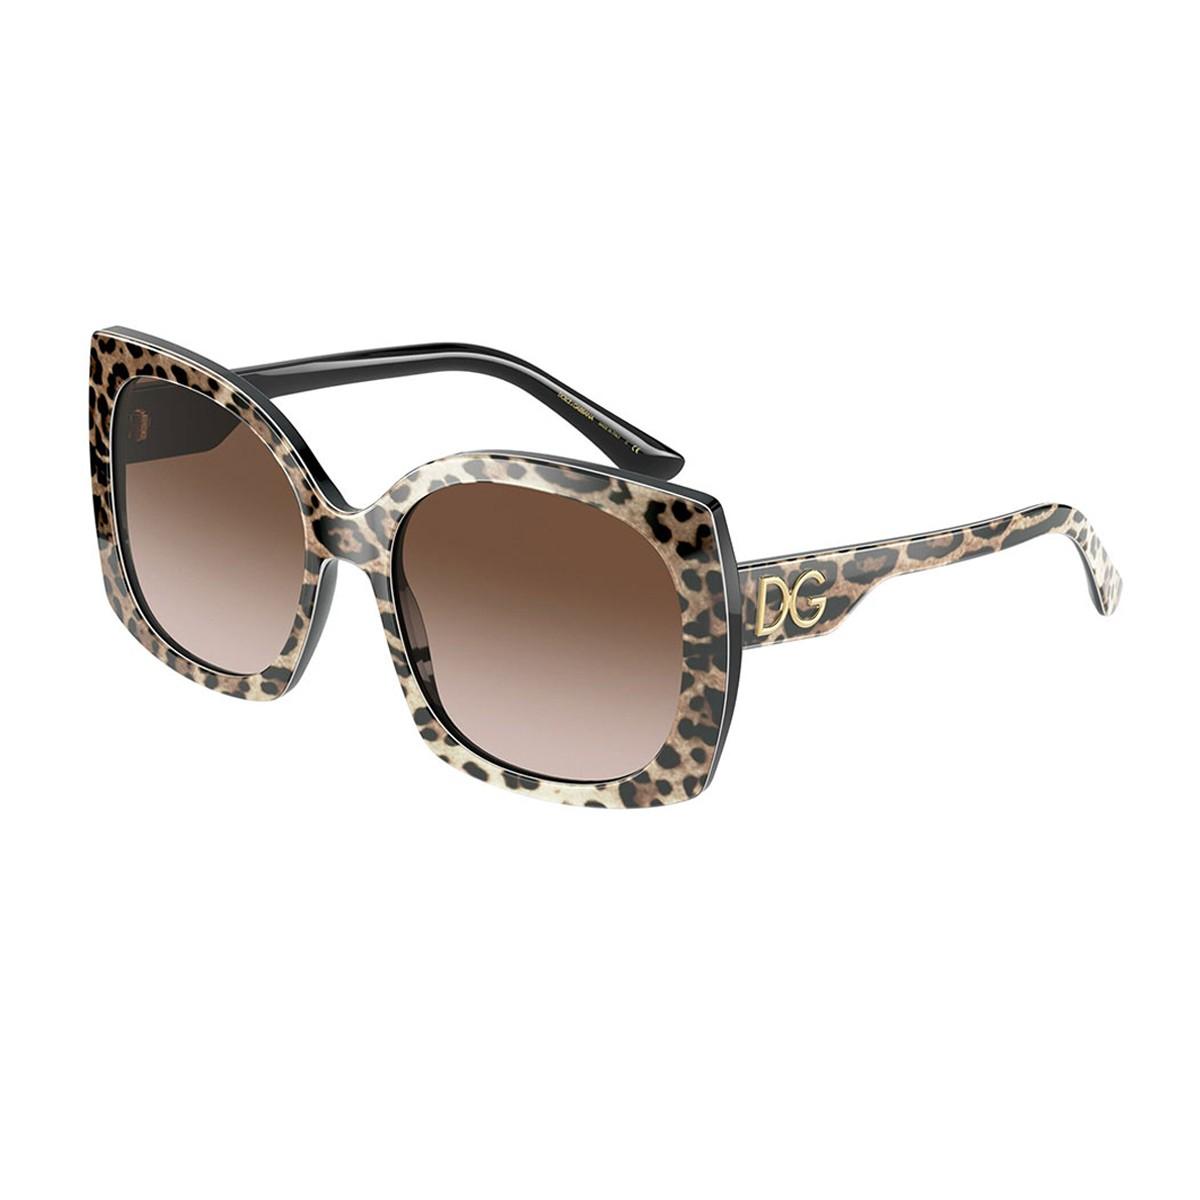 Dolce & Gabbana DG4385 | Women's sunglasses